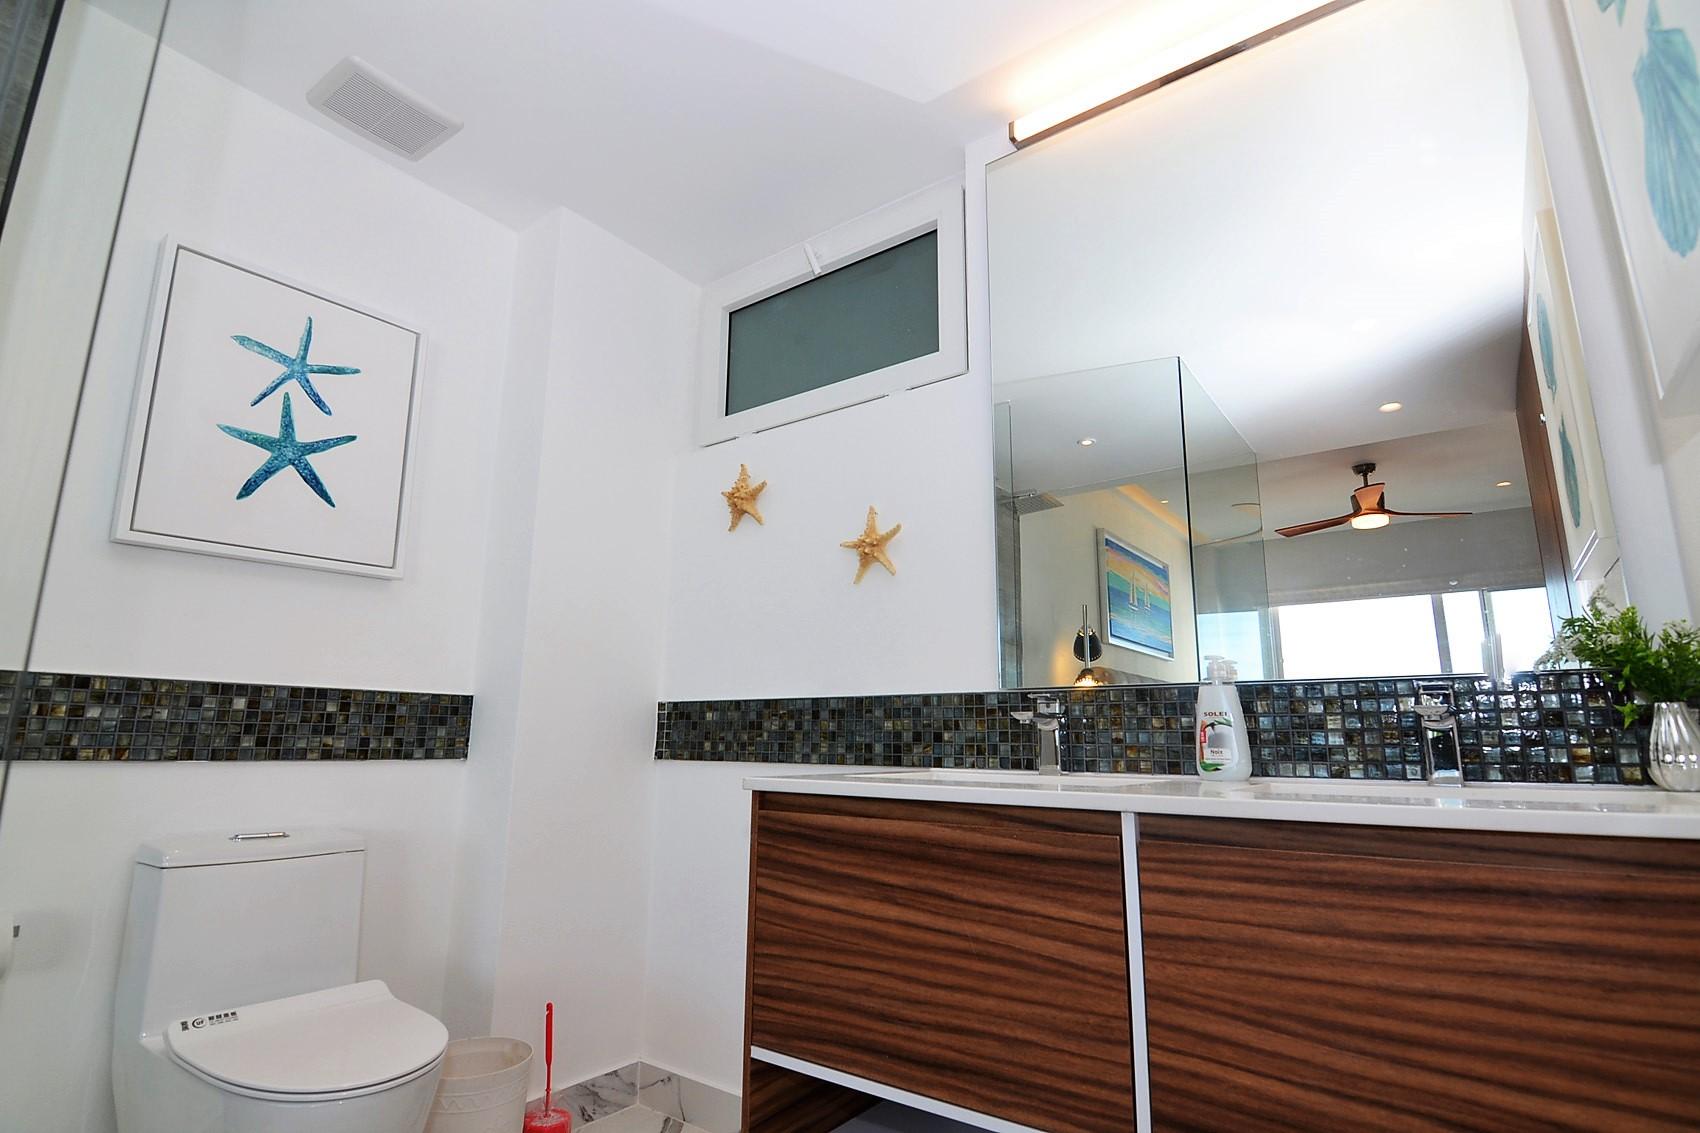 Condo Avida Super Studio 4 - Puerto Vallarta Furnished Condo Romantic Zone (24)